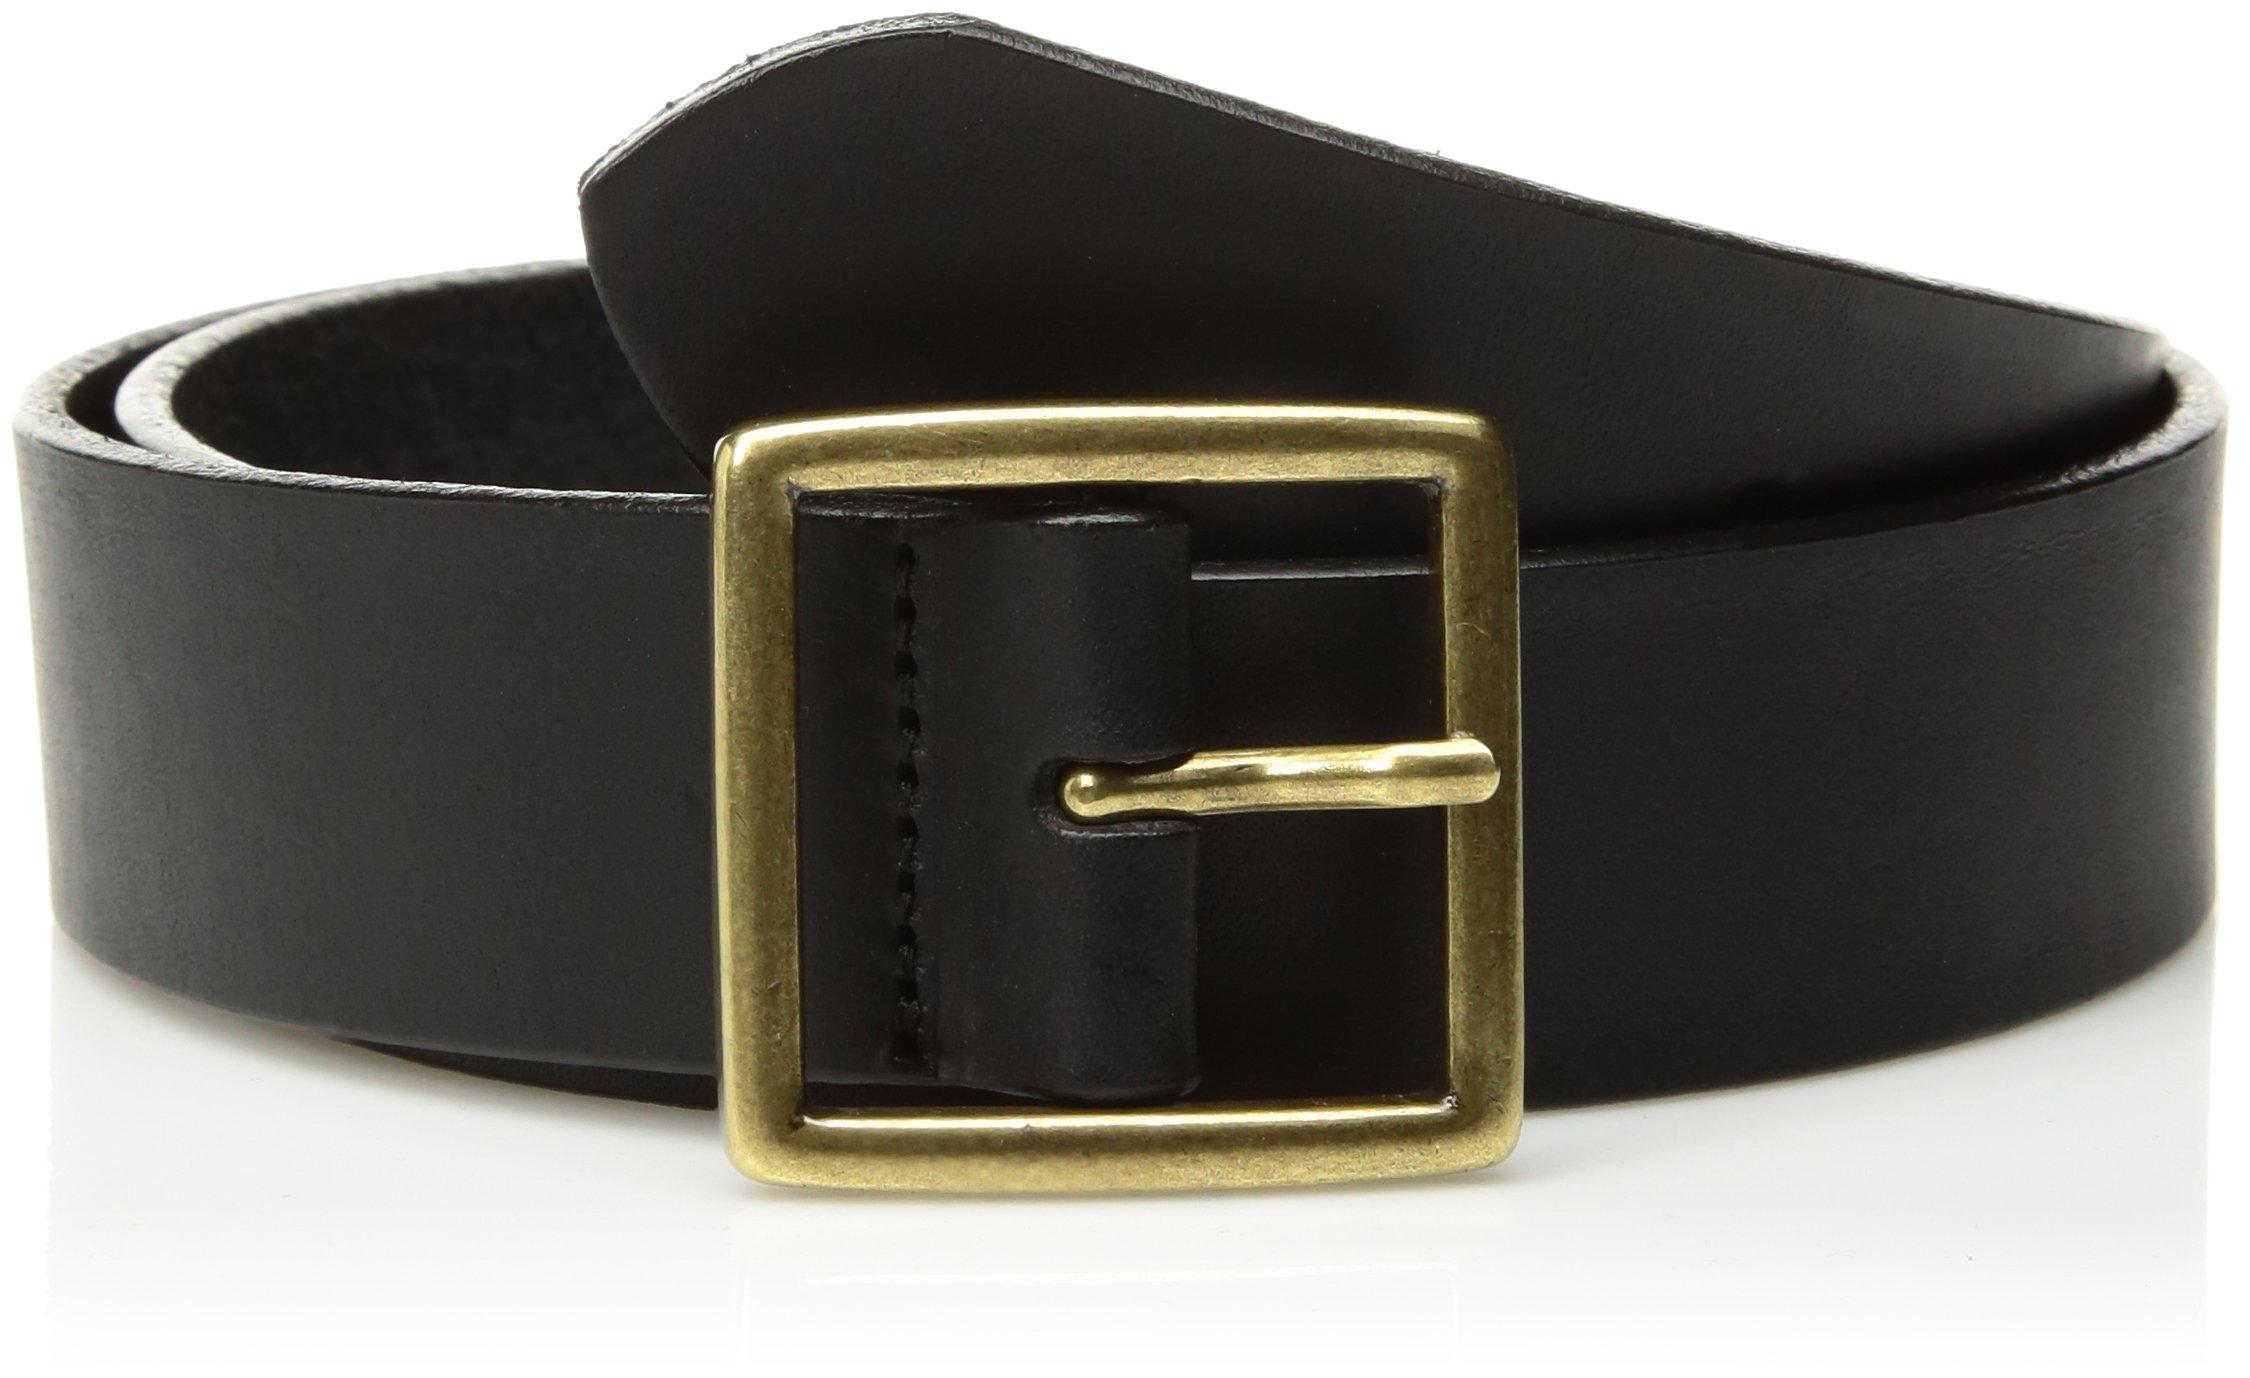 Circa Women's Handcrafted Italian Smooth Leather Belt, Black